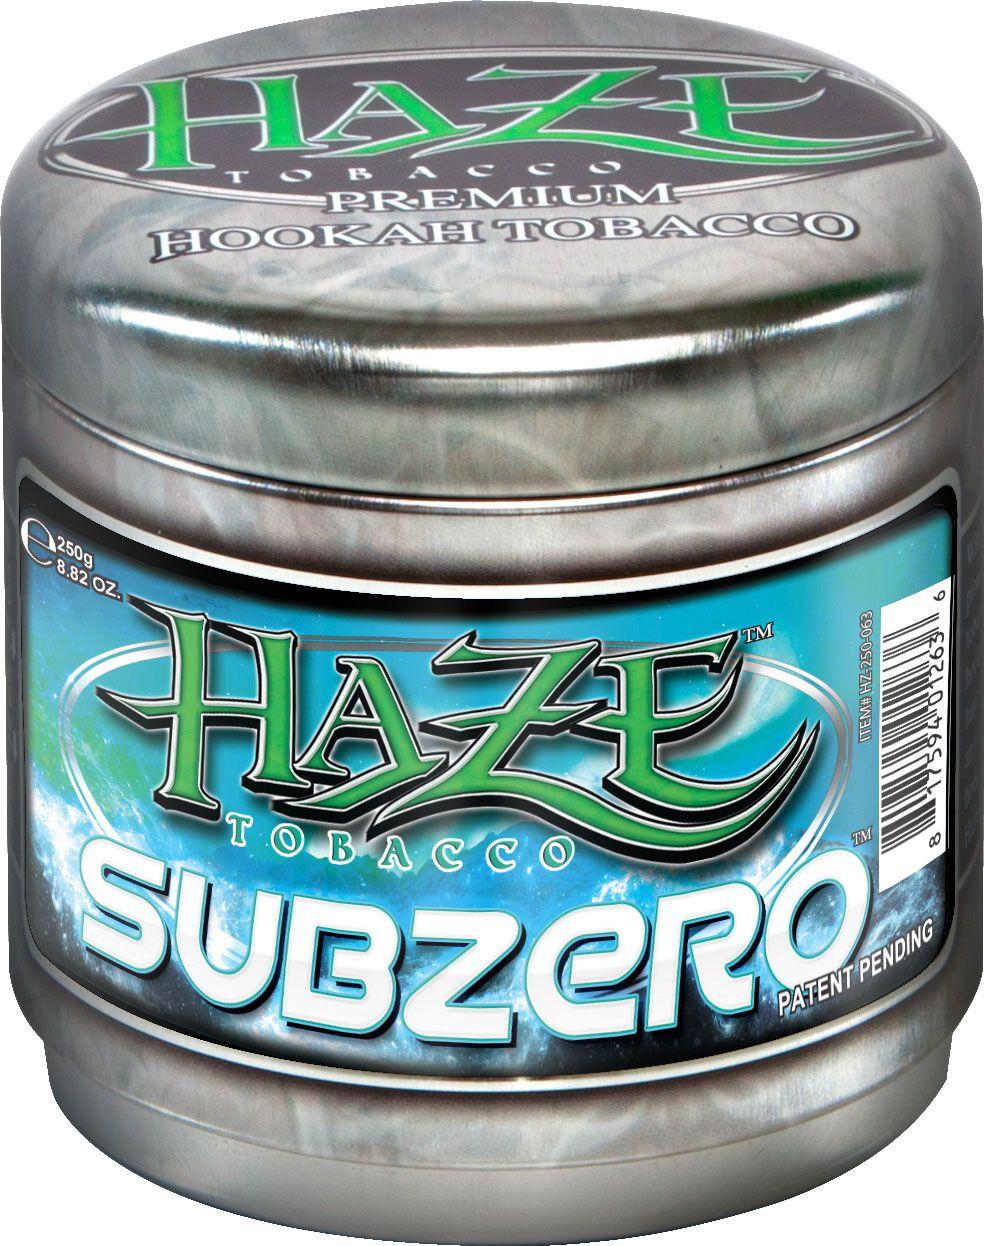 Haze - Sub Zero 100g